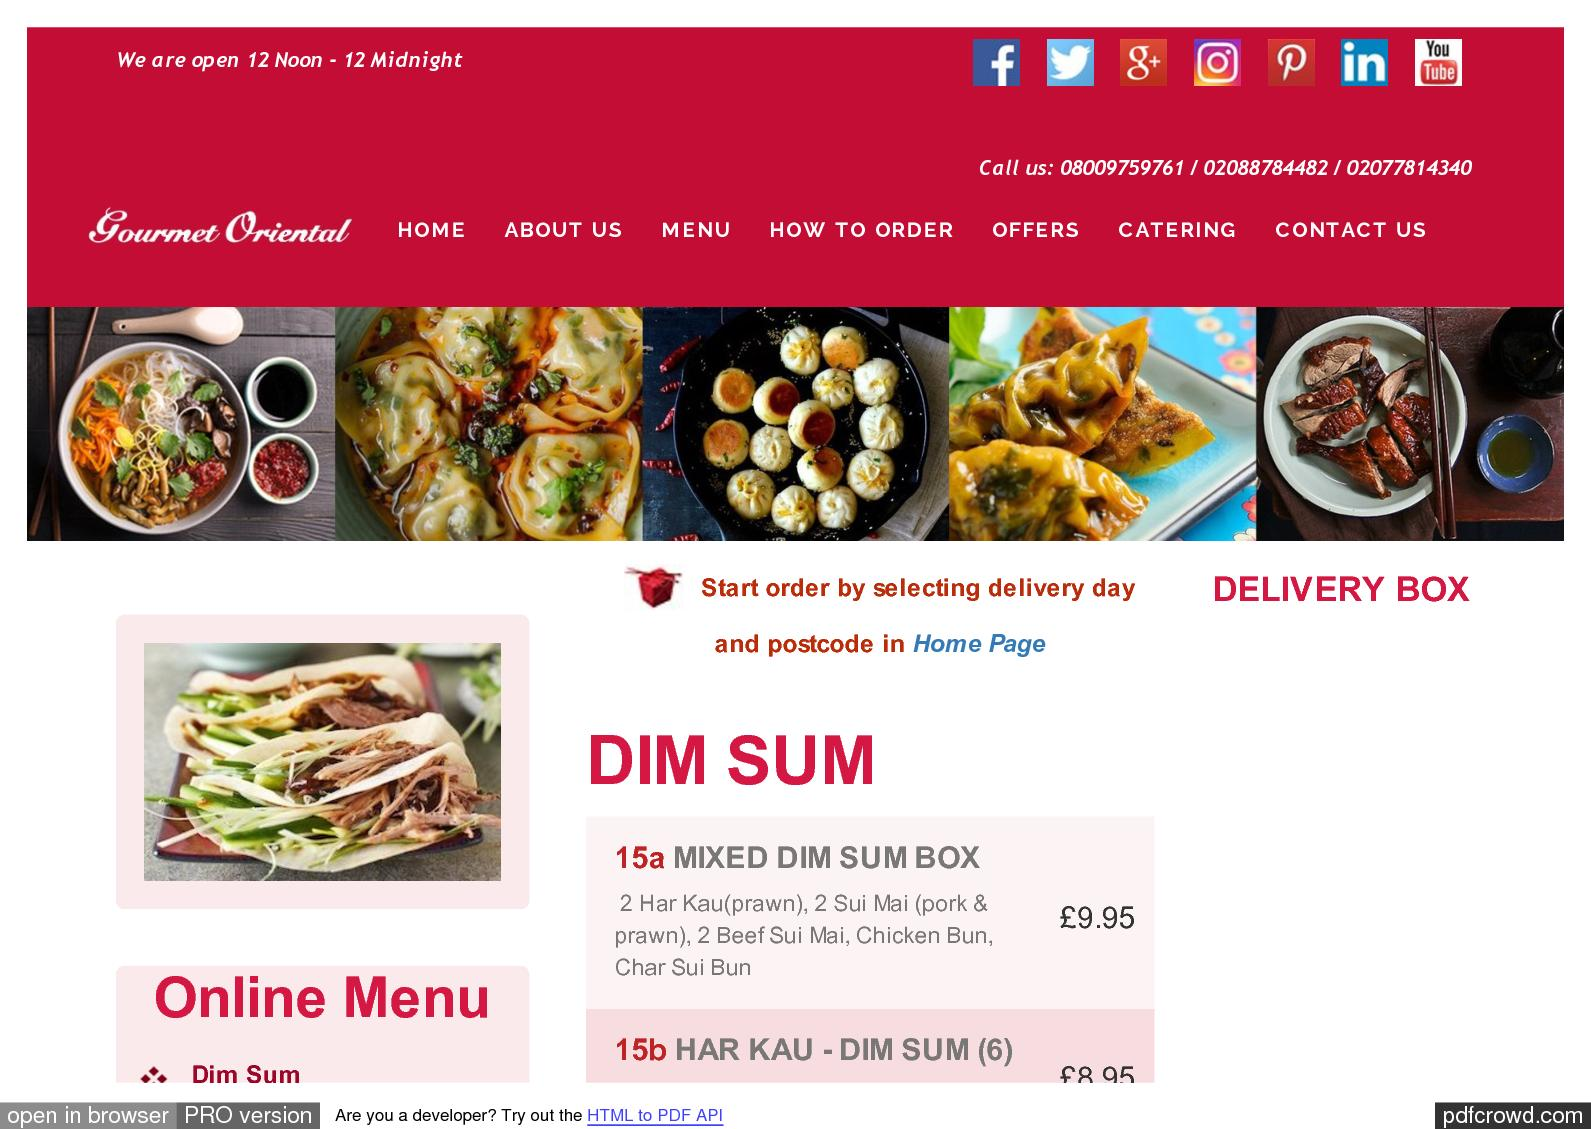 Calamo dim sum online menu gourmet oriental london pdf forumfinder Image collections